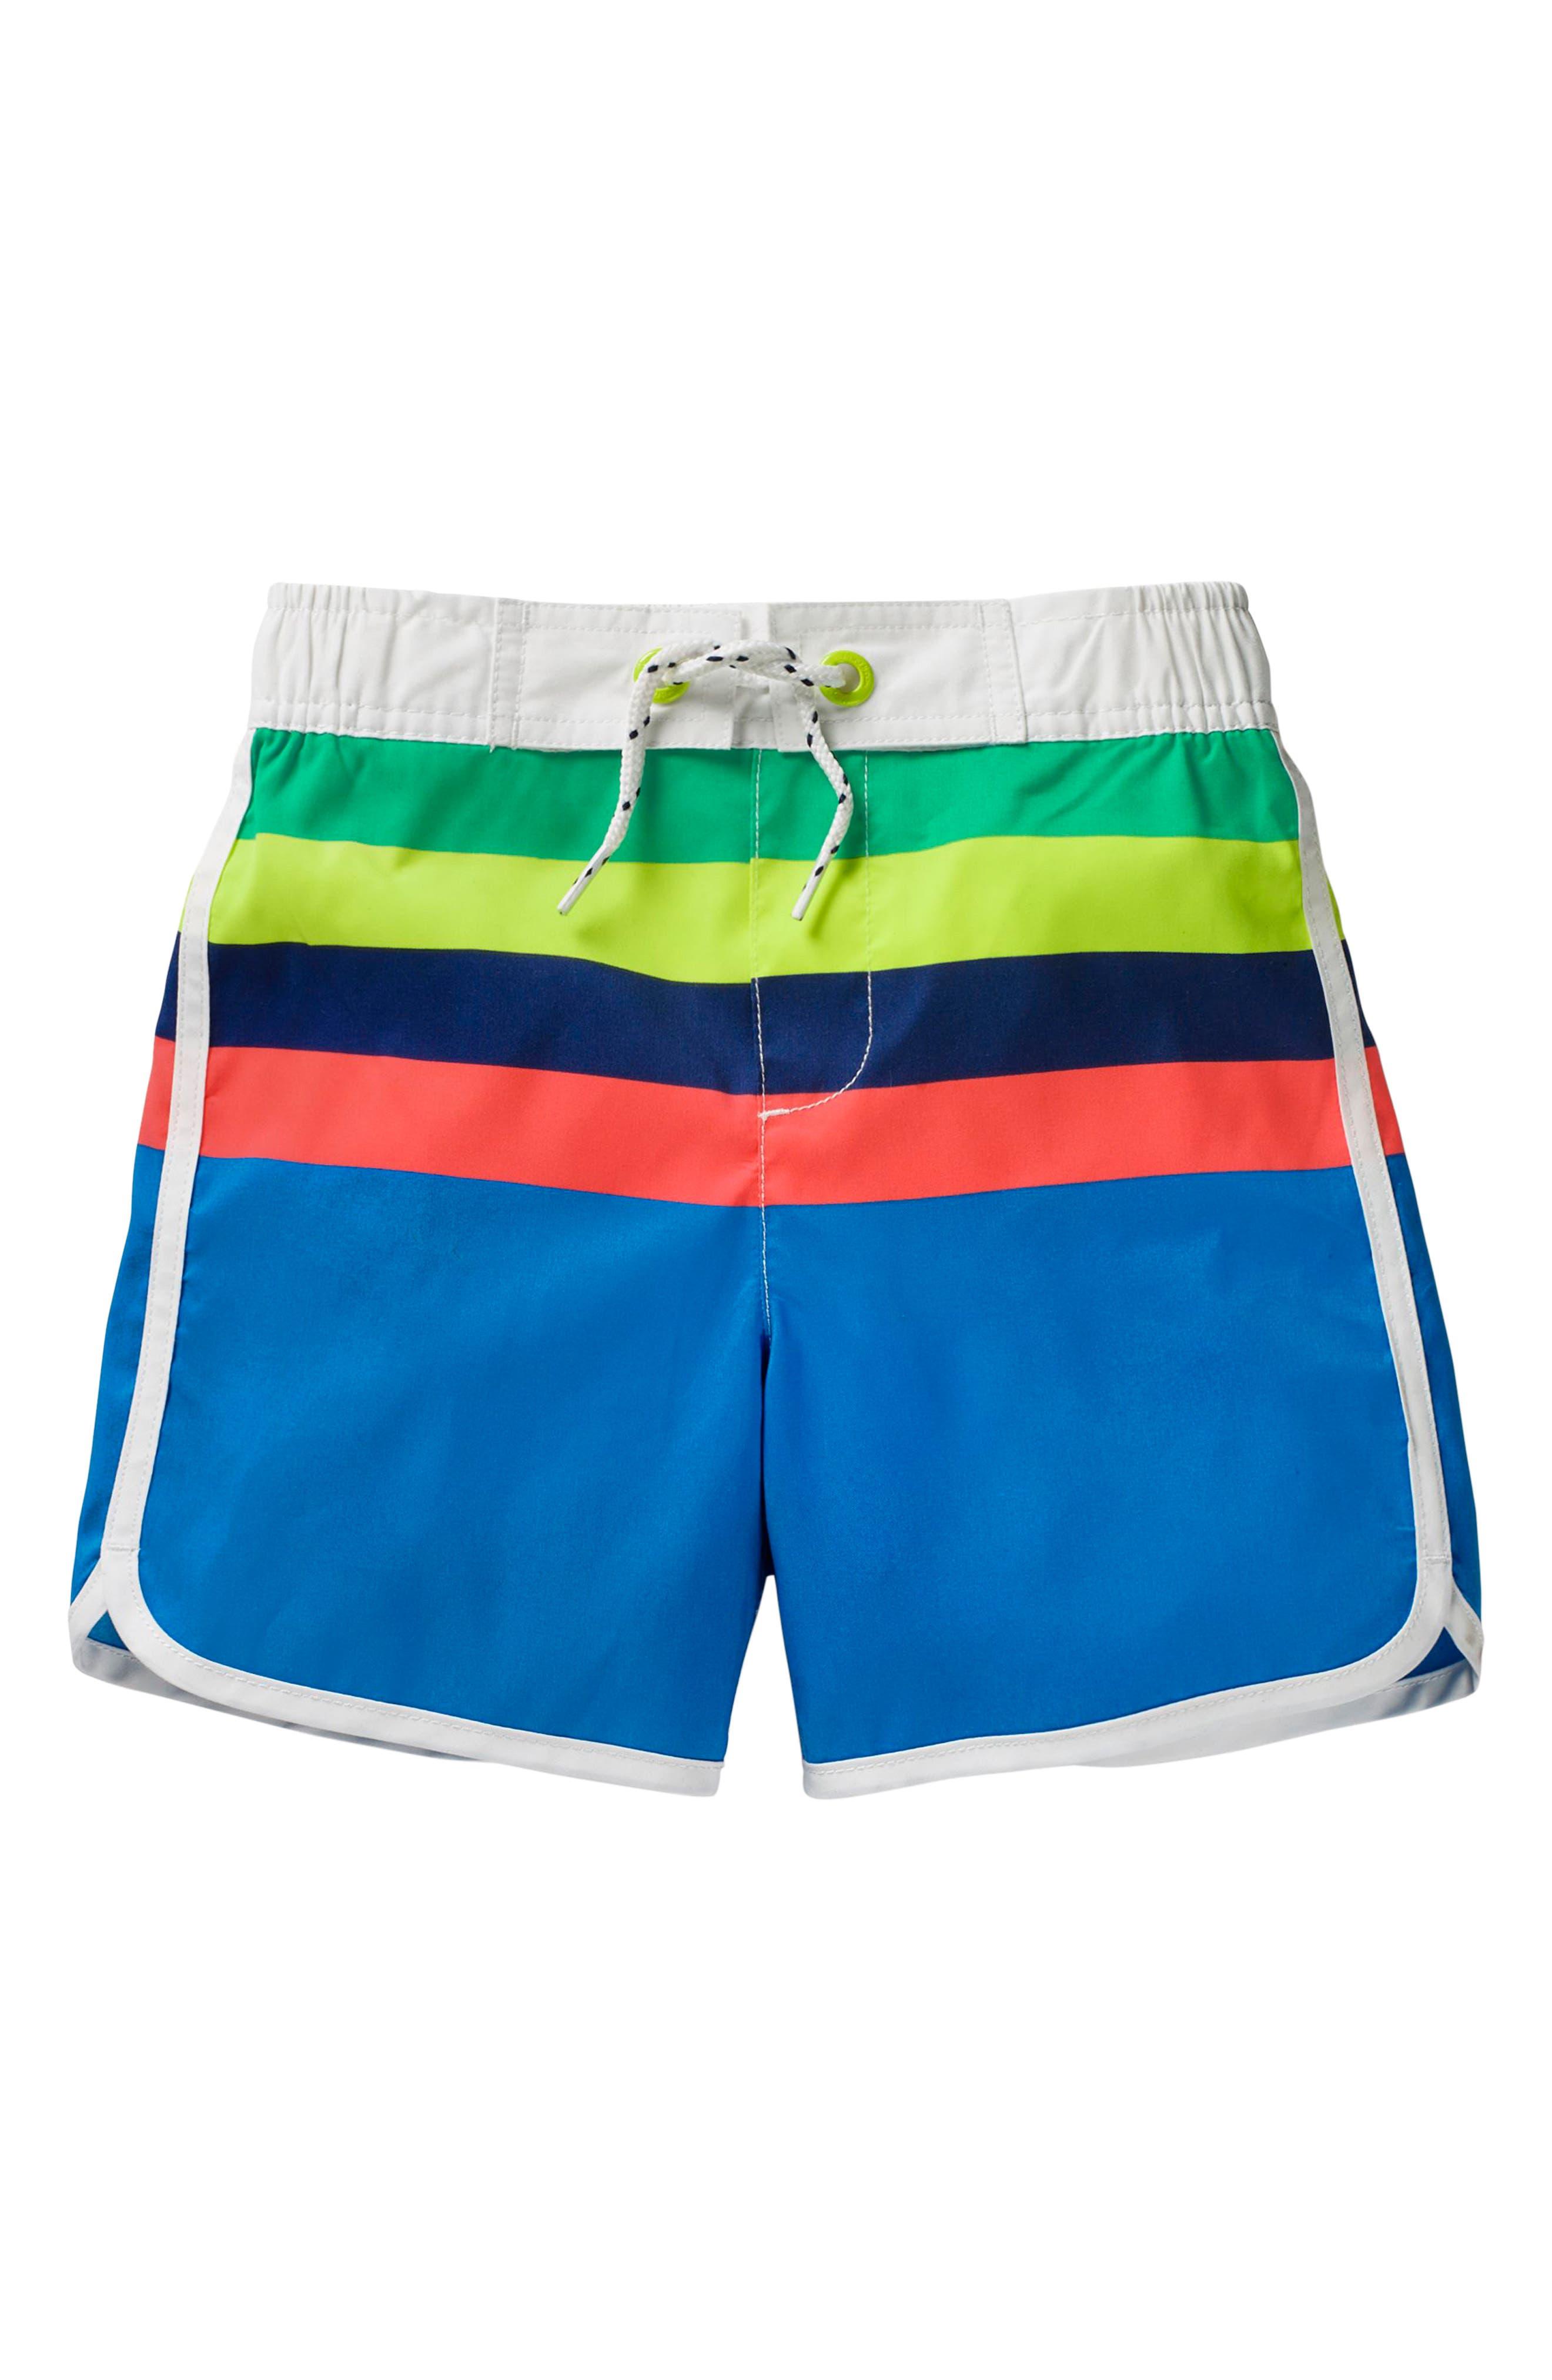 Stripe Board Shorts,                             Main thumbnail 1, color,                             Electric Blue/ Lemonade Multi